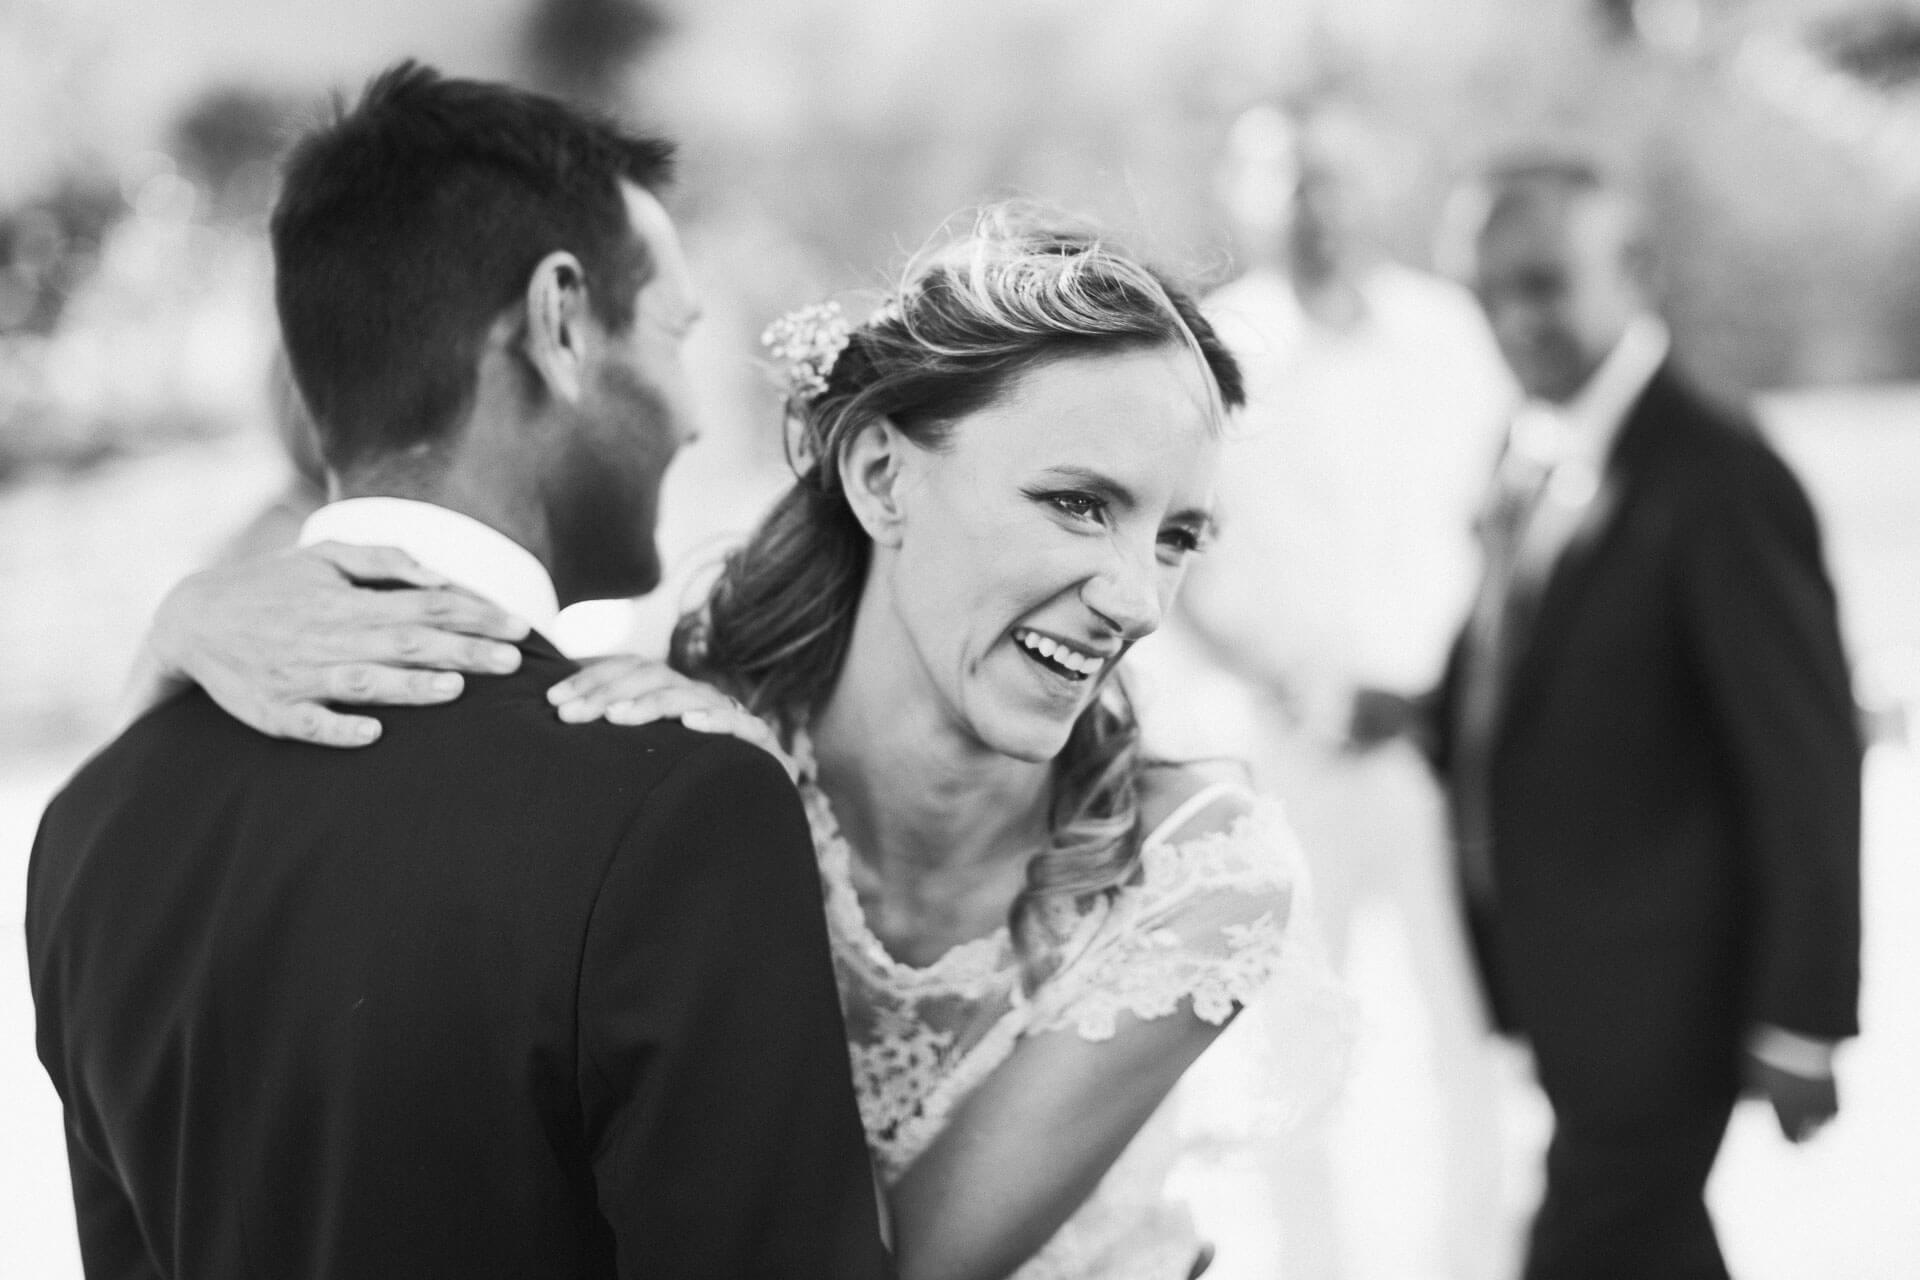 photographe-mariage-aix-en-provence-stephanie-jerome-17